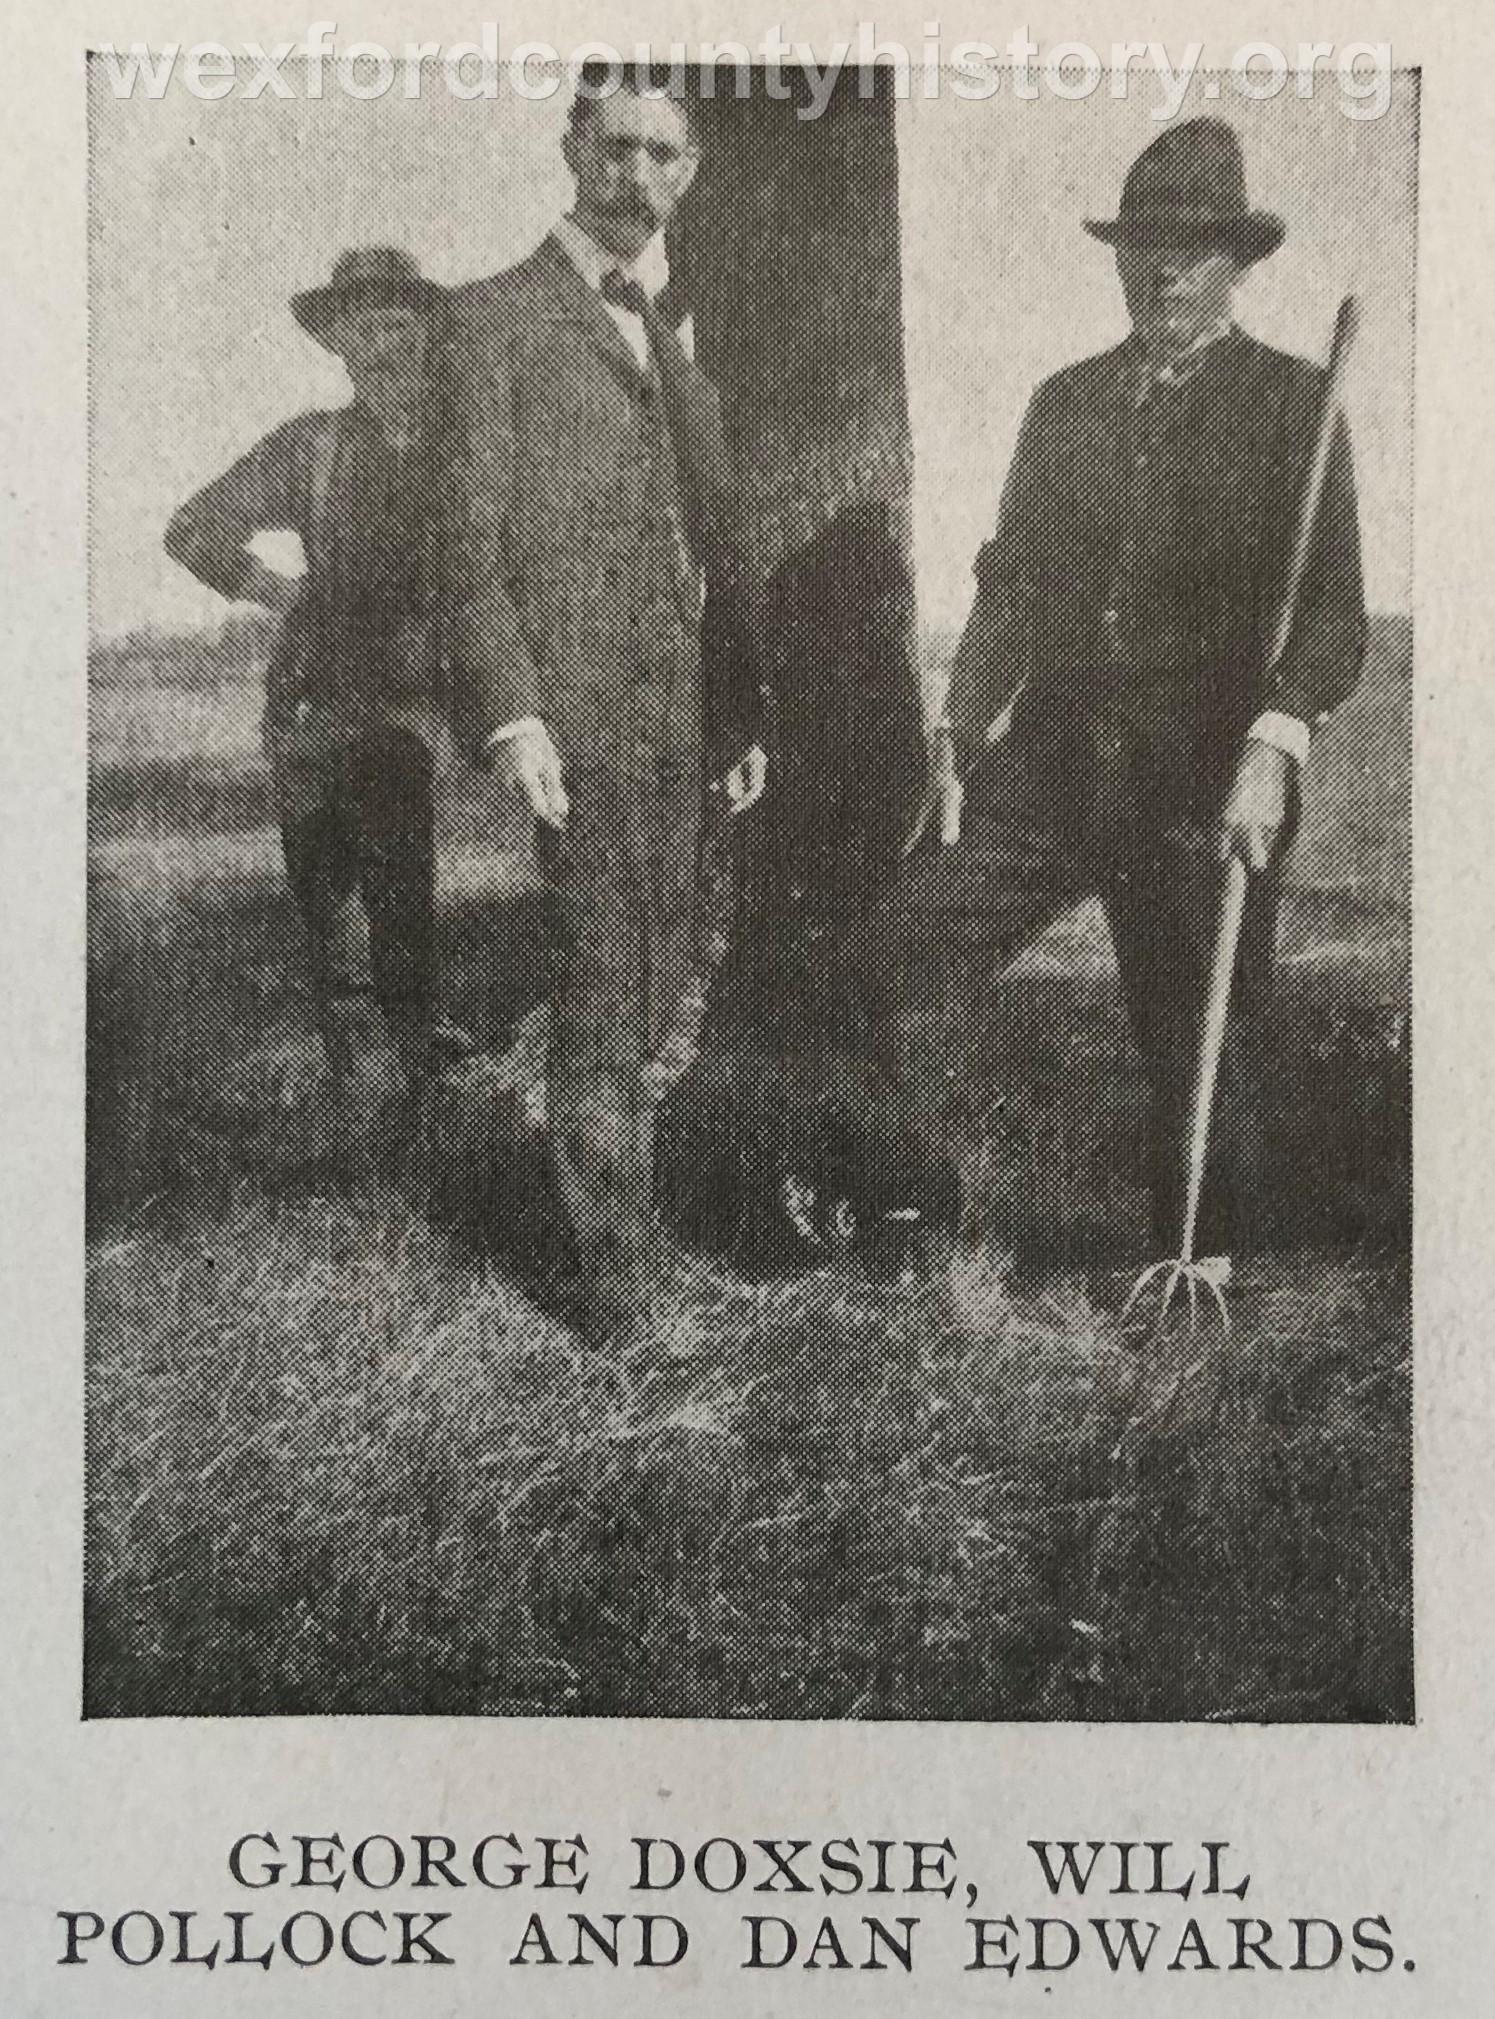 George Doxie, William Pollock And Daniel Edwards